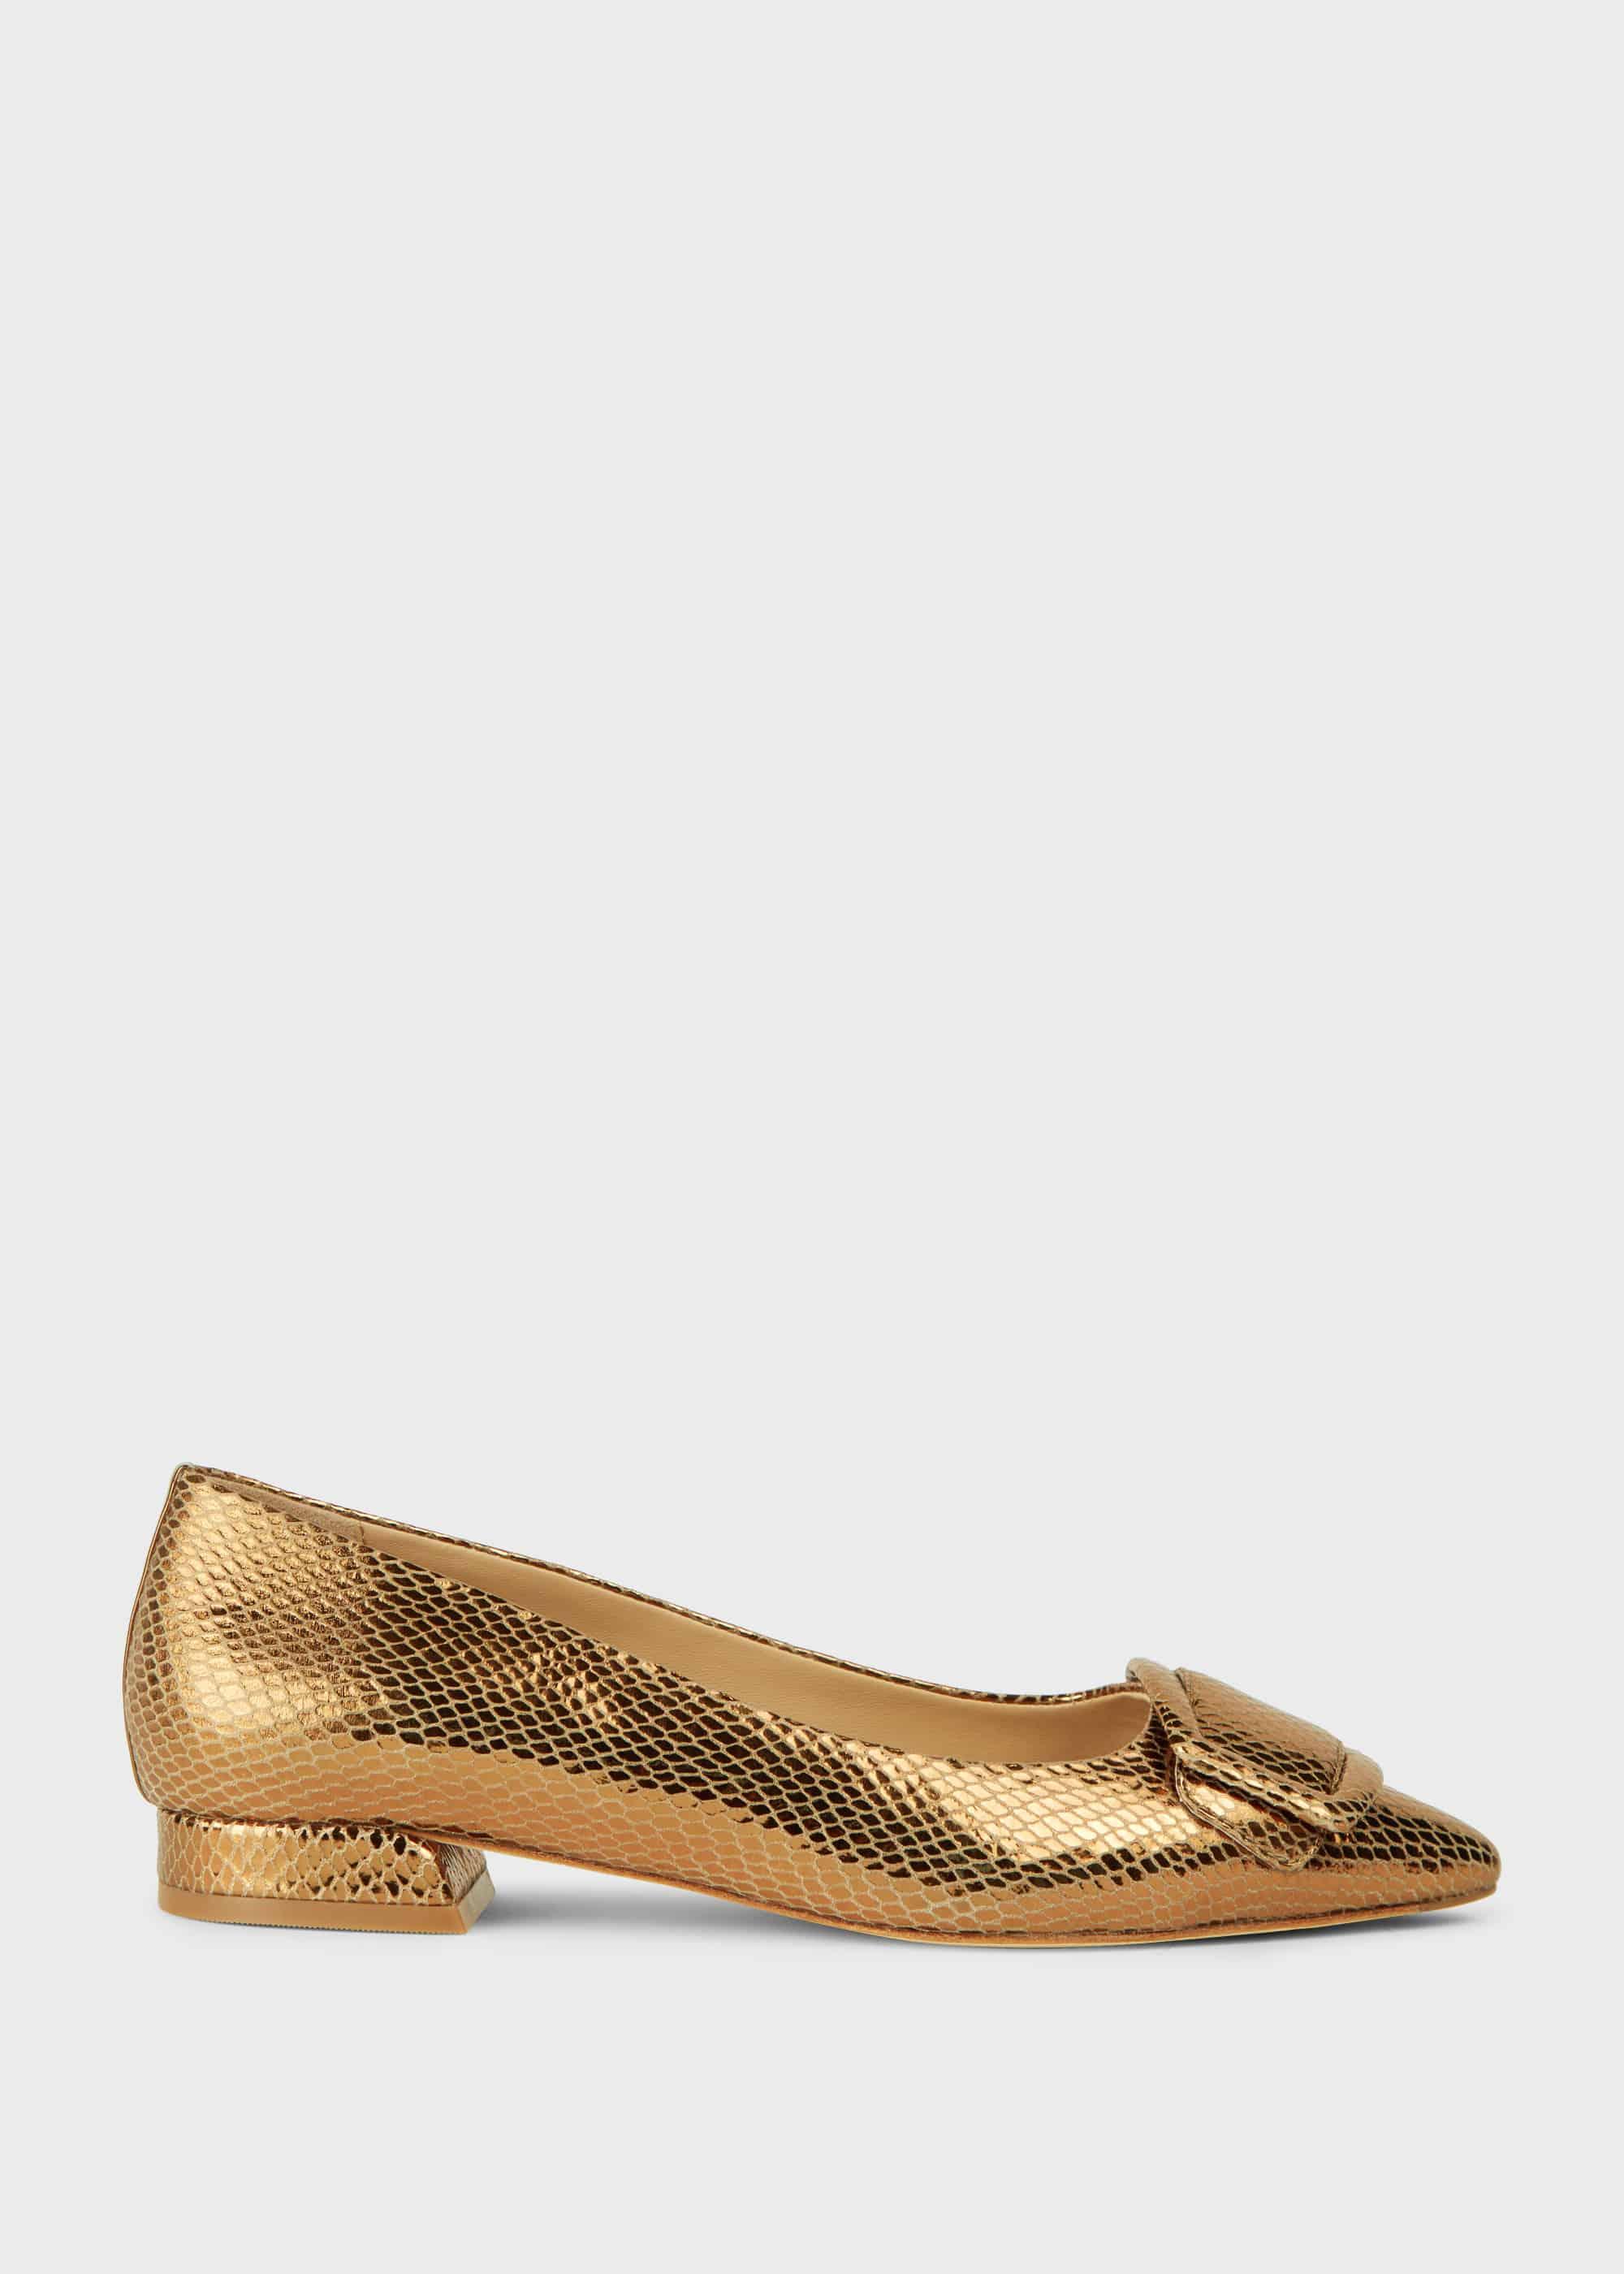 Hobbs Women Alison Leather Flat Shoes